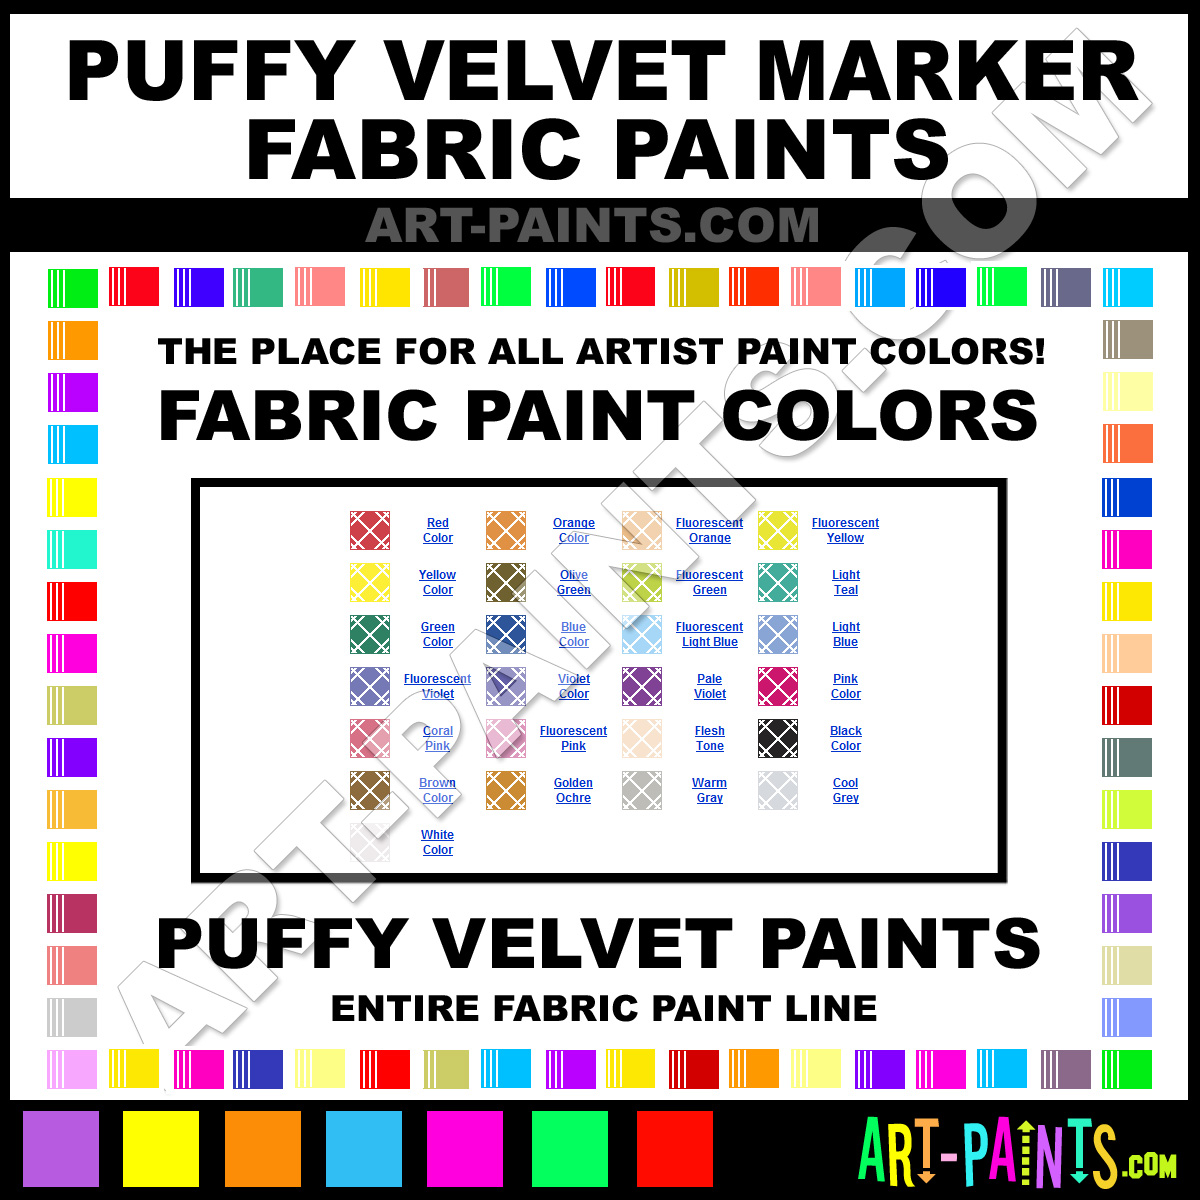 Coral Paint Color Chart Coral Pink Marker Fabric Textile Paints 1022 Coral Pink Paint